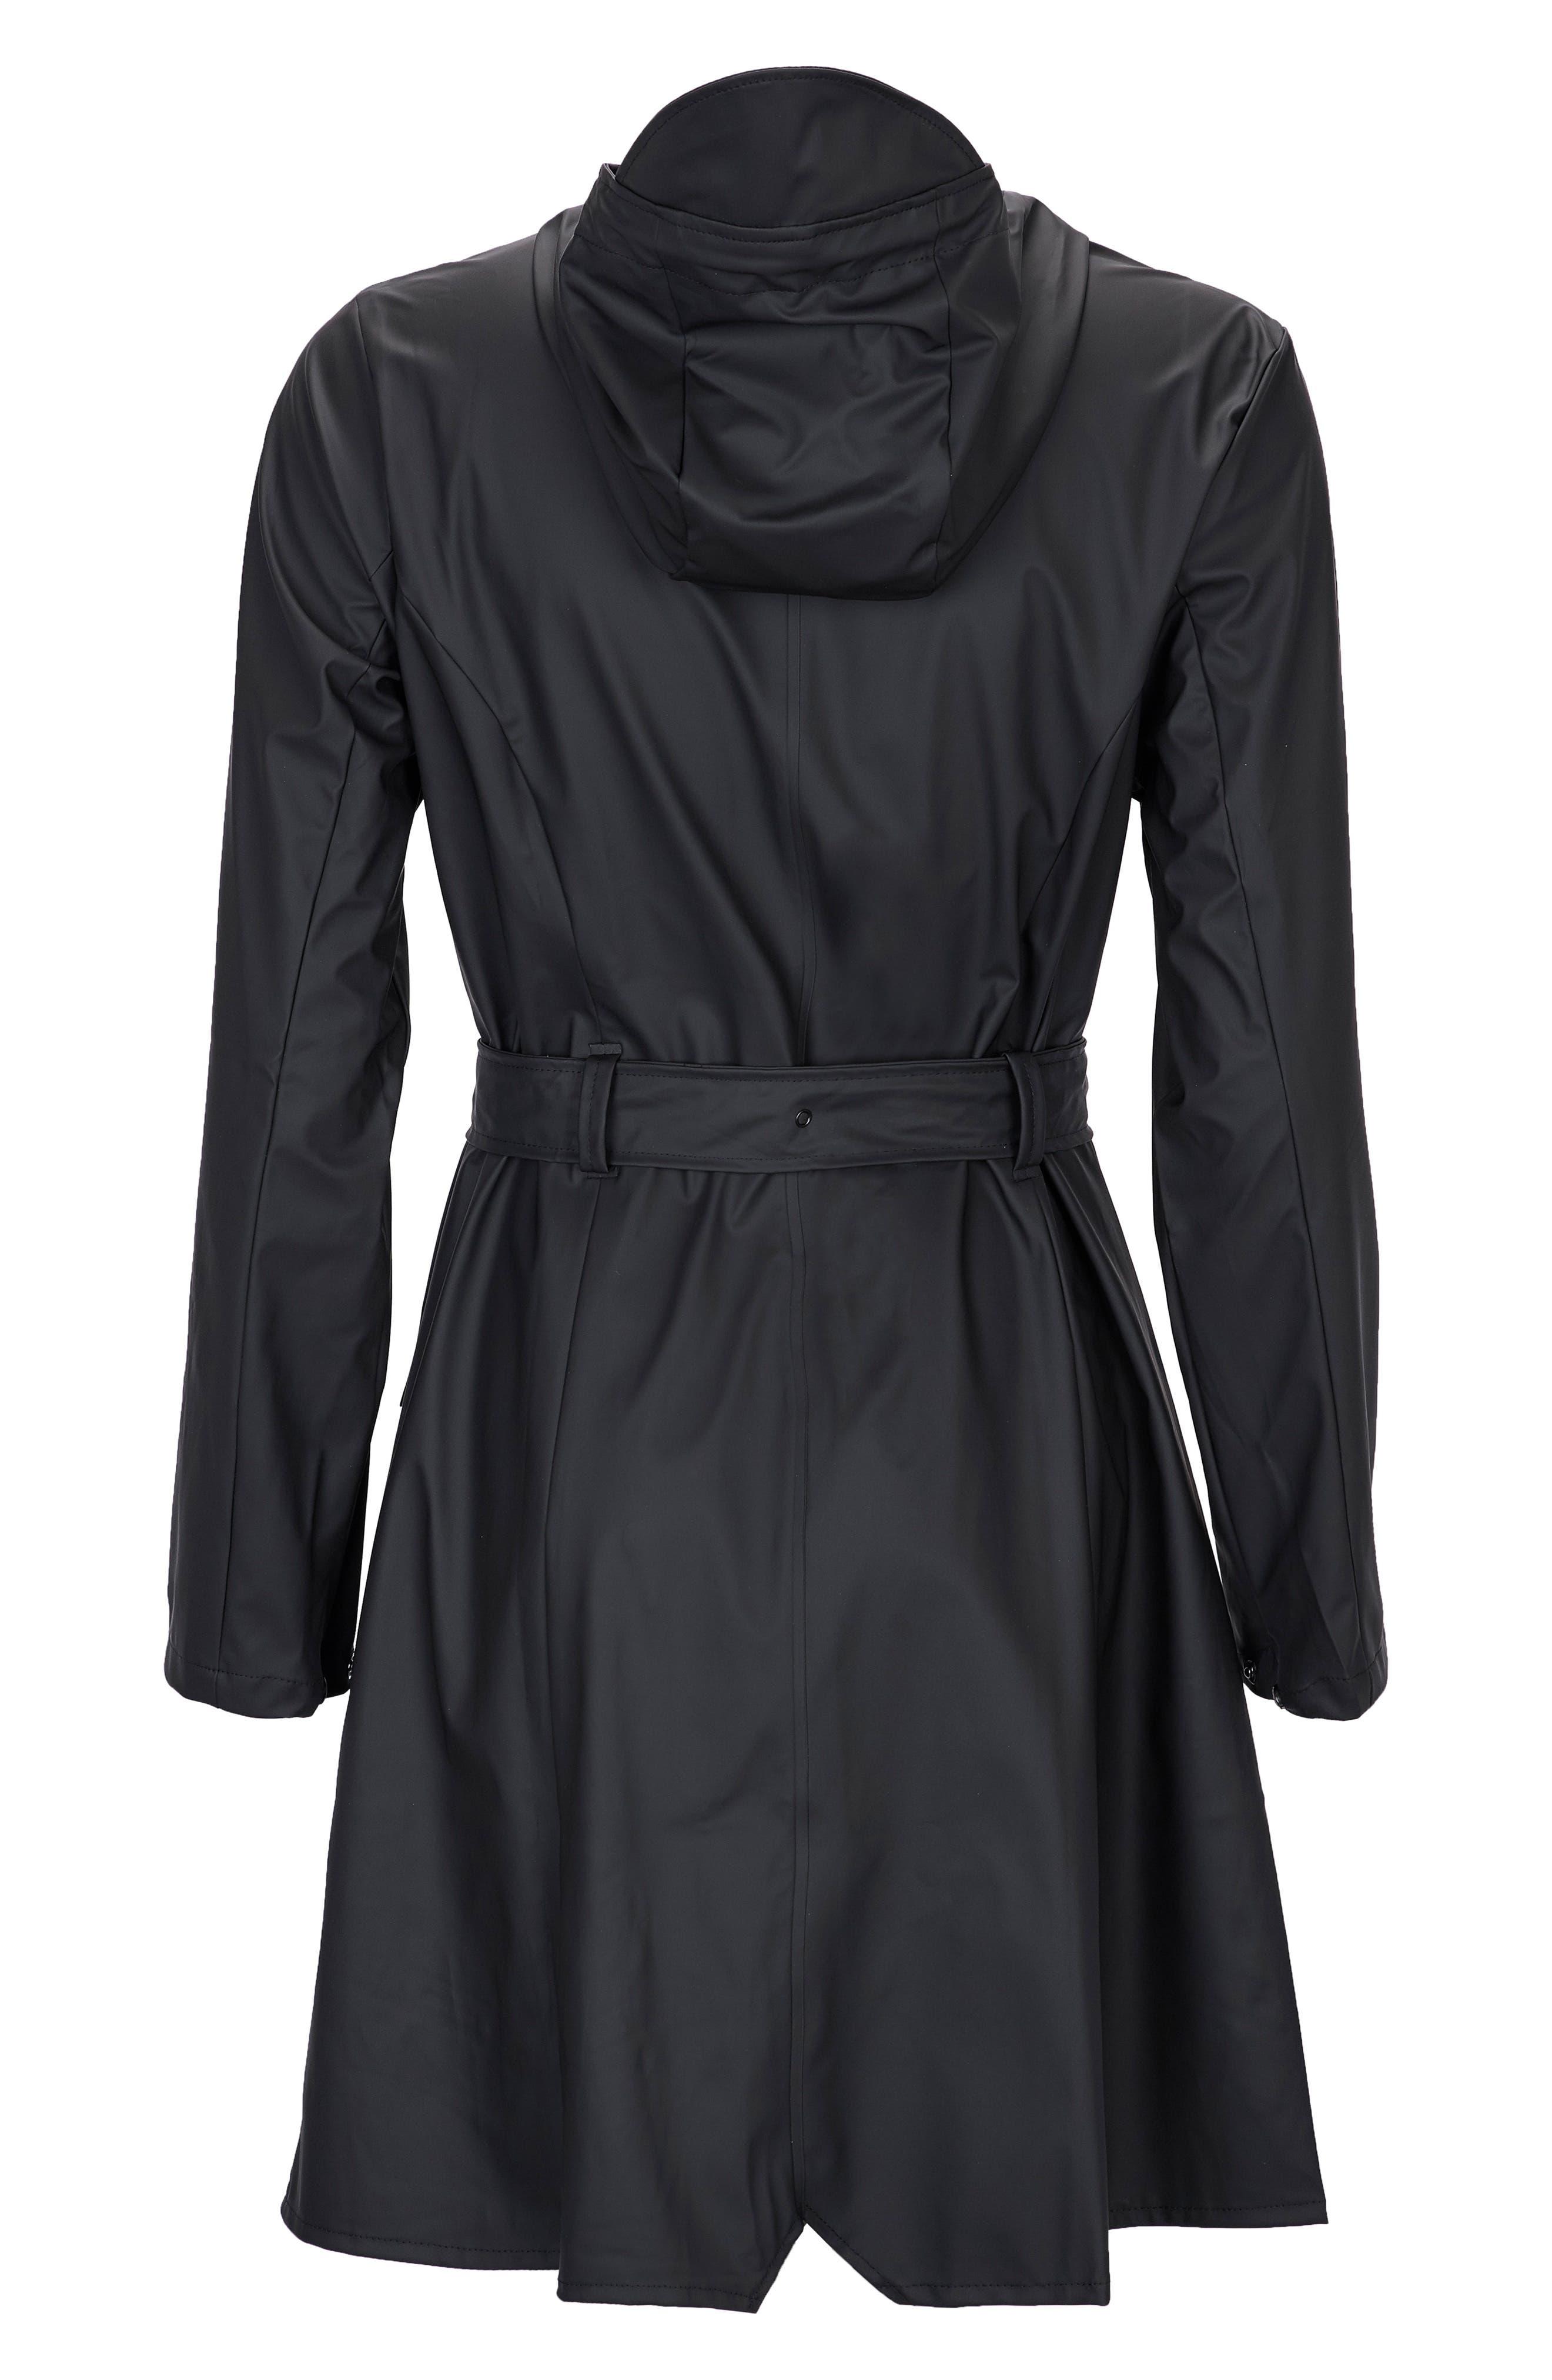 Curve Waterproof Hooded Rain Jacket,                             Alternate thumbnail 4, color,                             BLACK